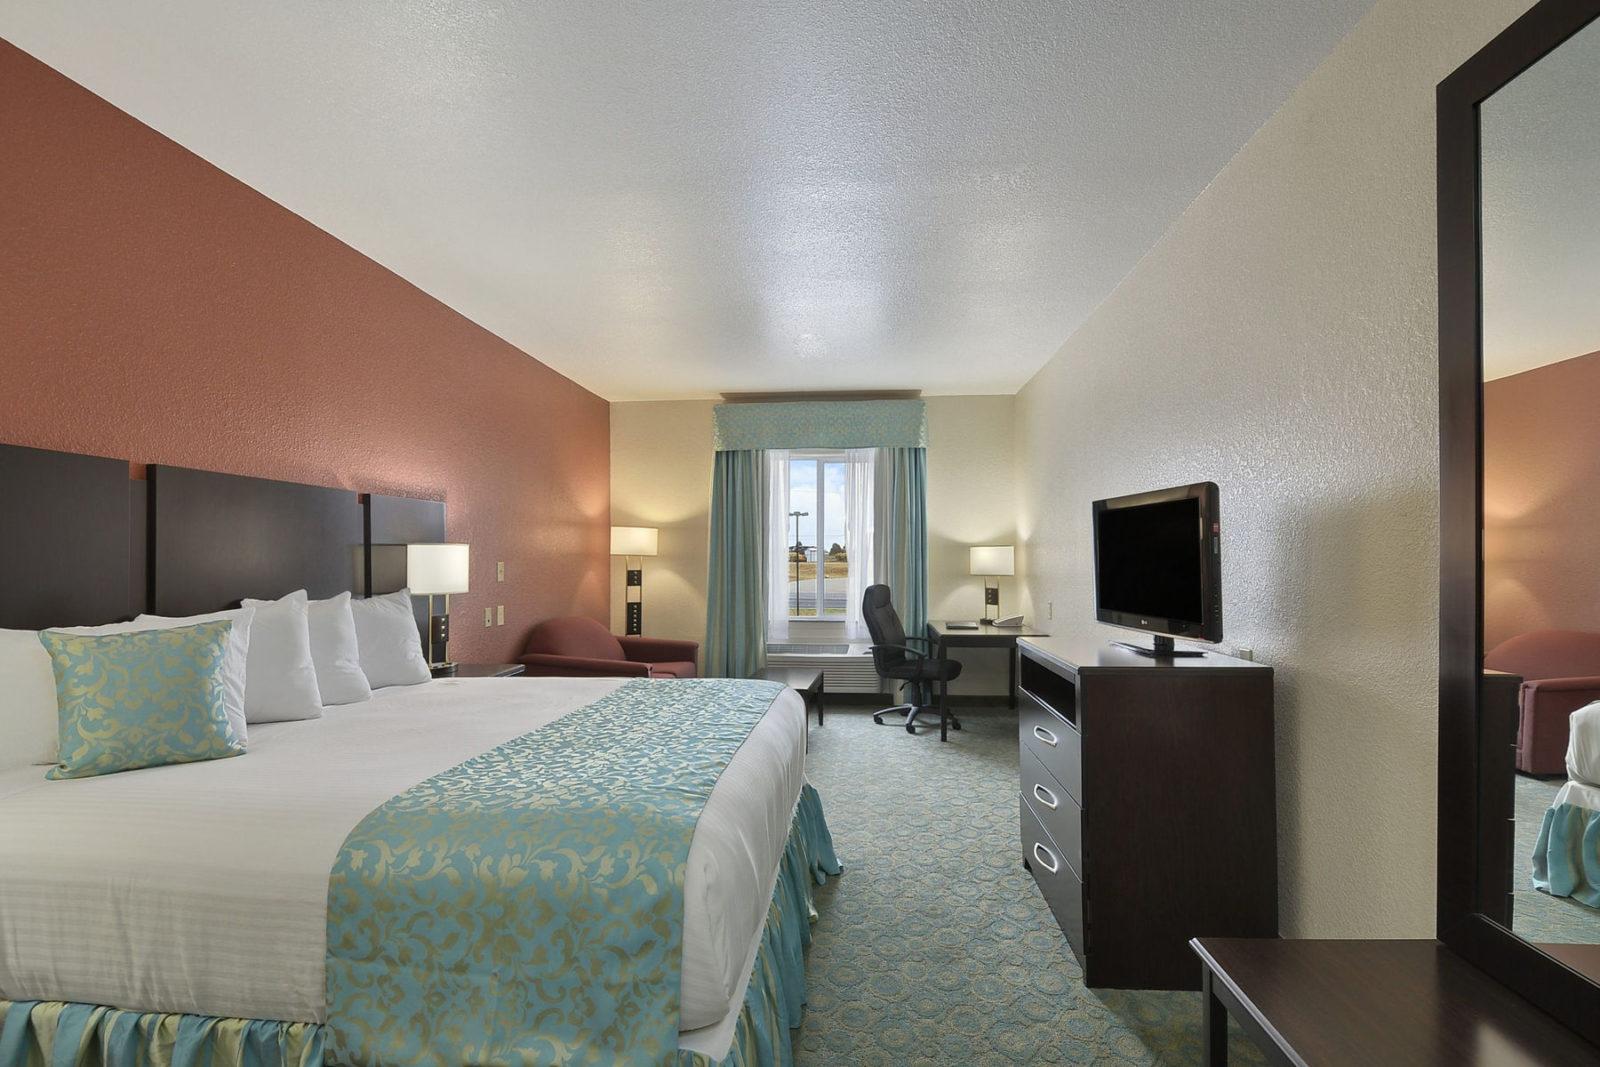 24633 Guest Room 1